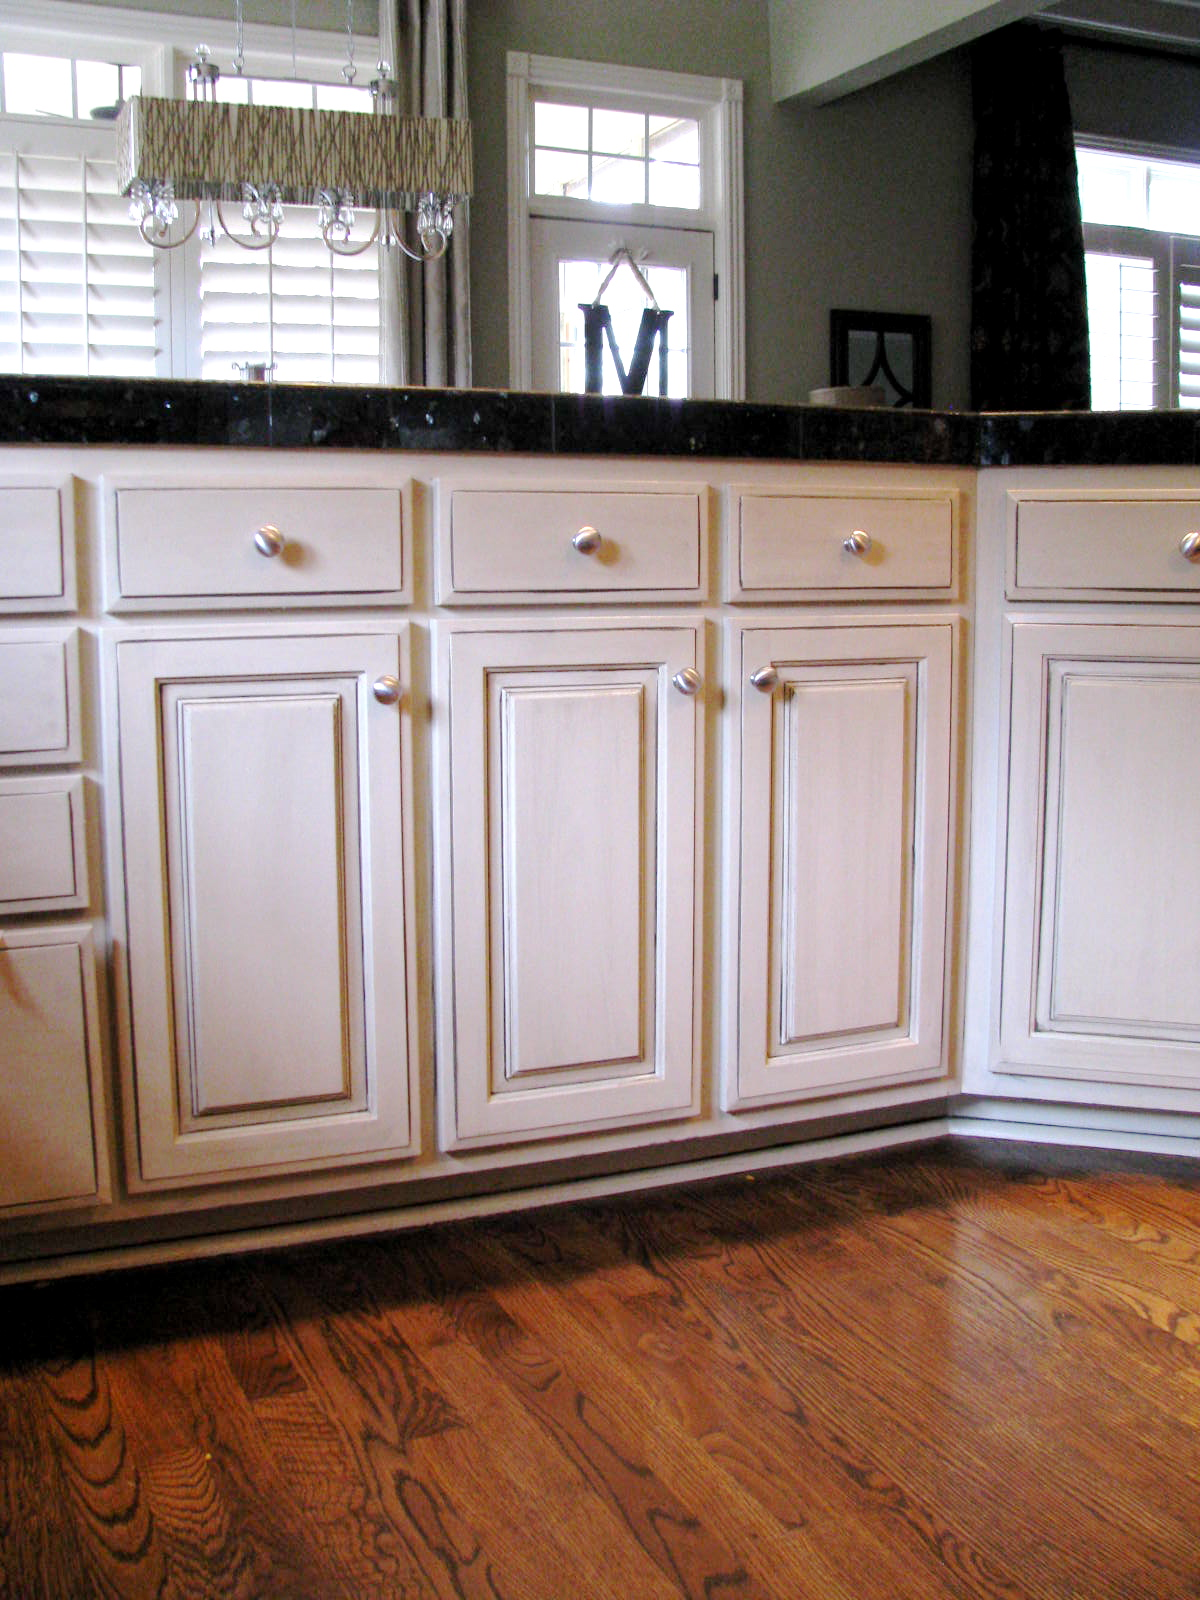 glazed kitchen cabinets large wall clocks cream with chocolate glaze